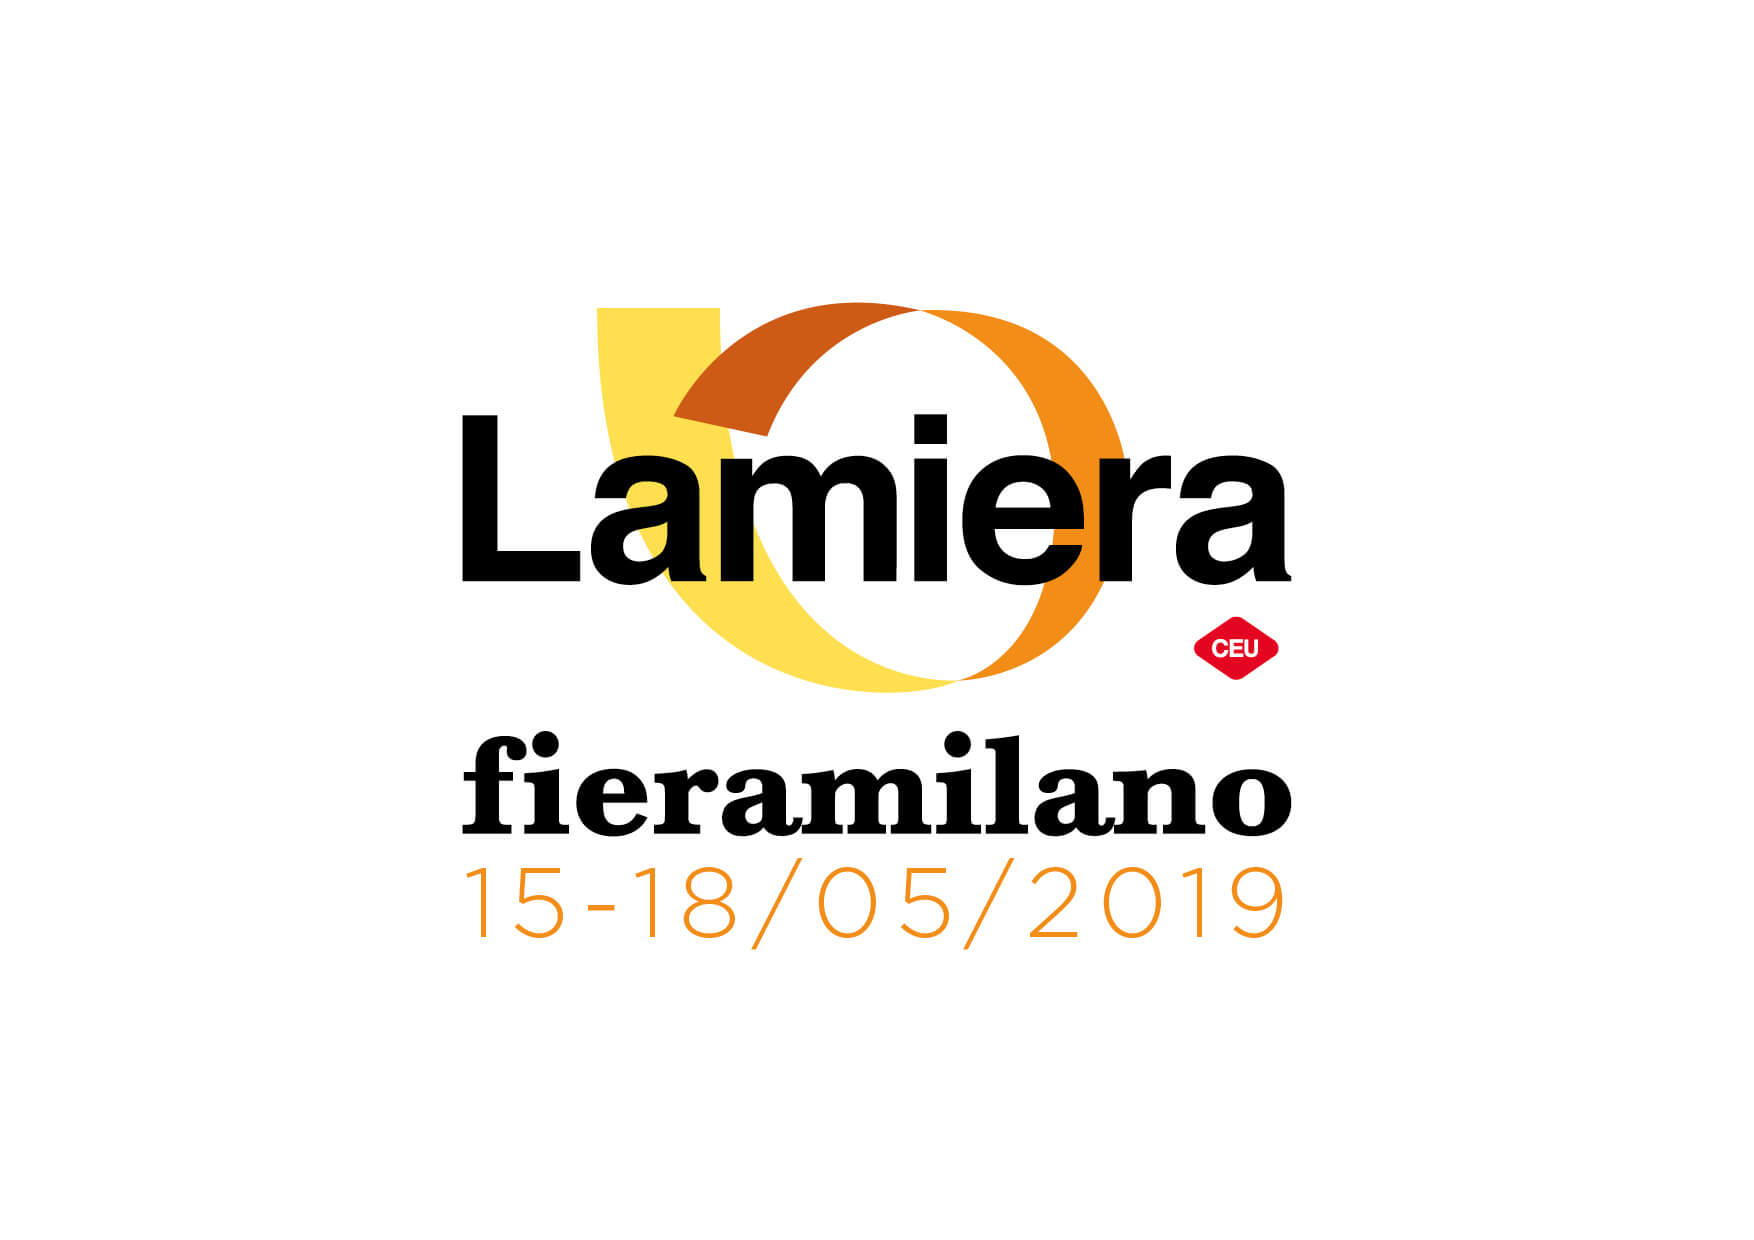 LAMIERA 2019